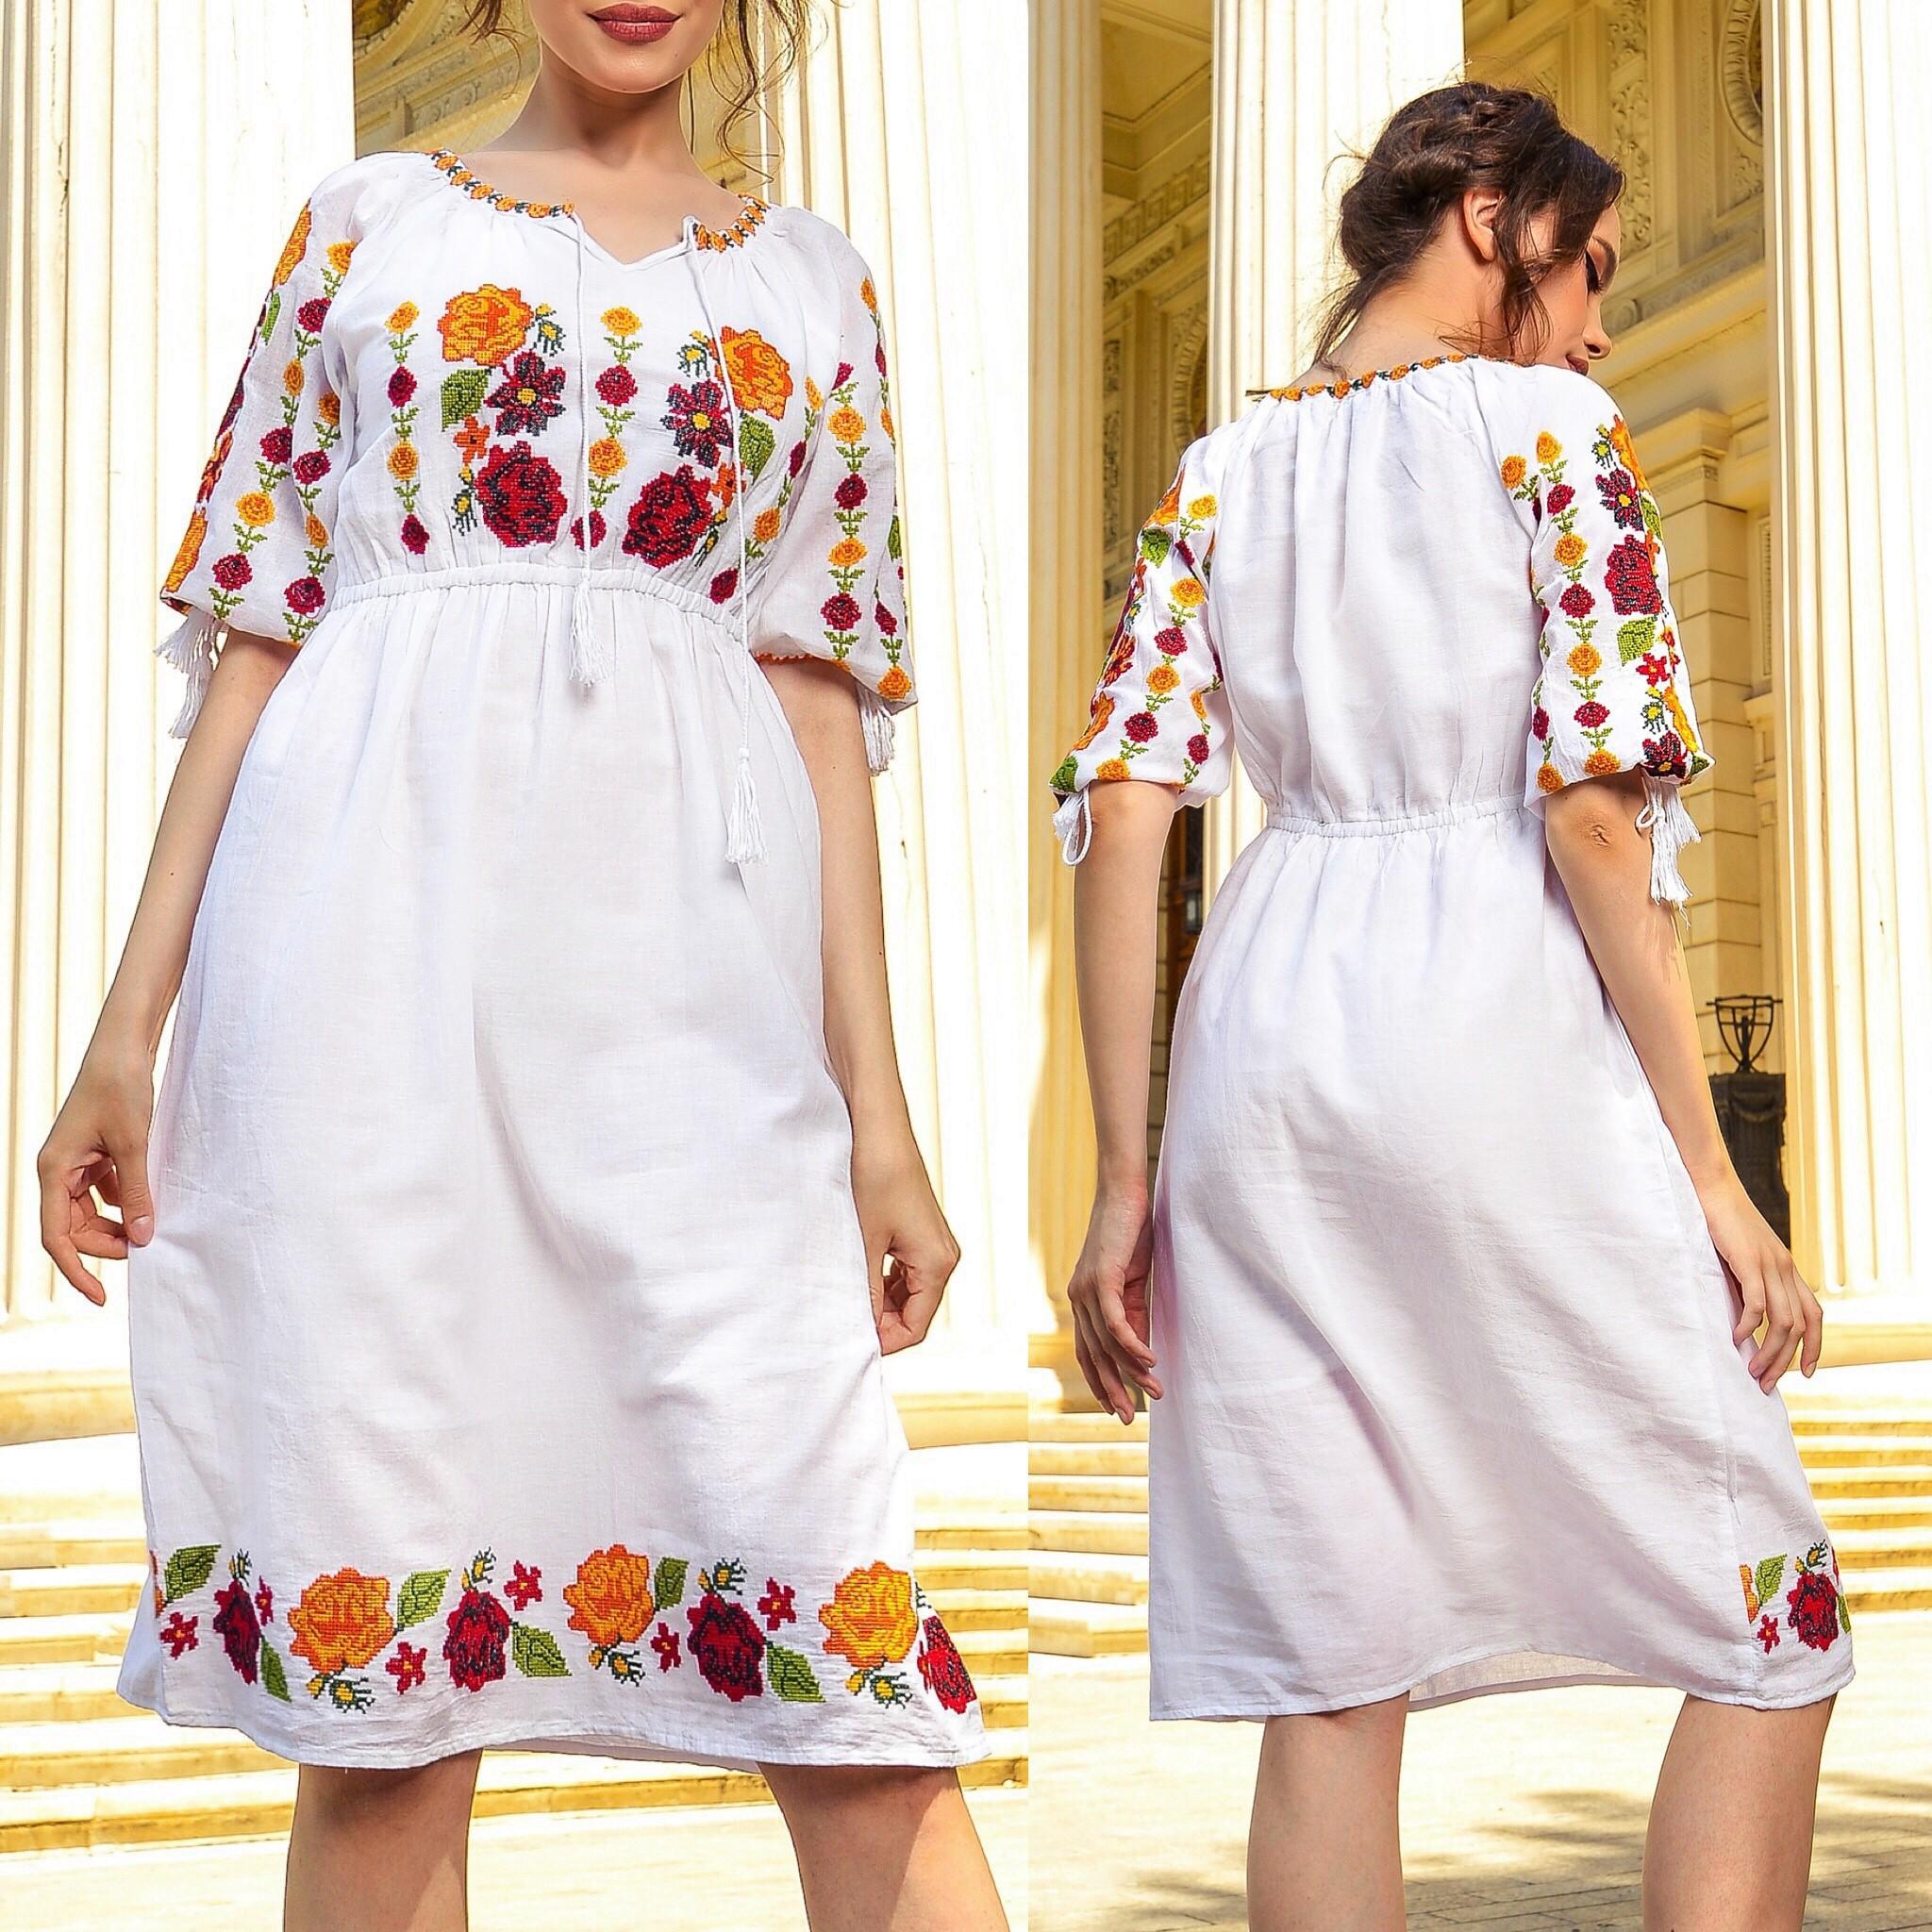 preț mai mic cu coduri promoționale produse noi calde Rochie Traditionala alba cu flori brodate - Daria - Stylishcircle.ro